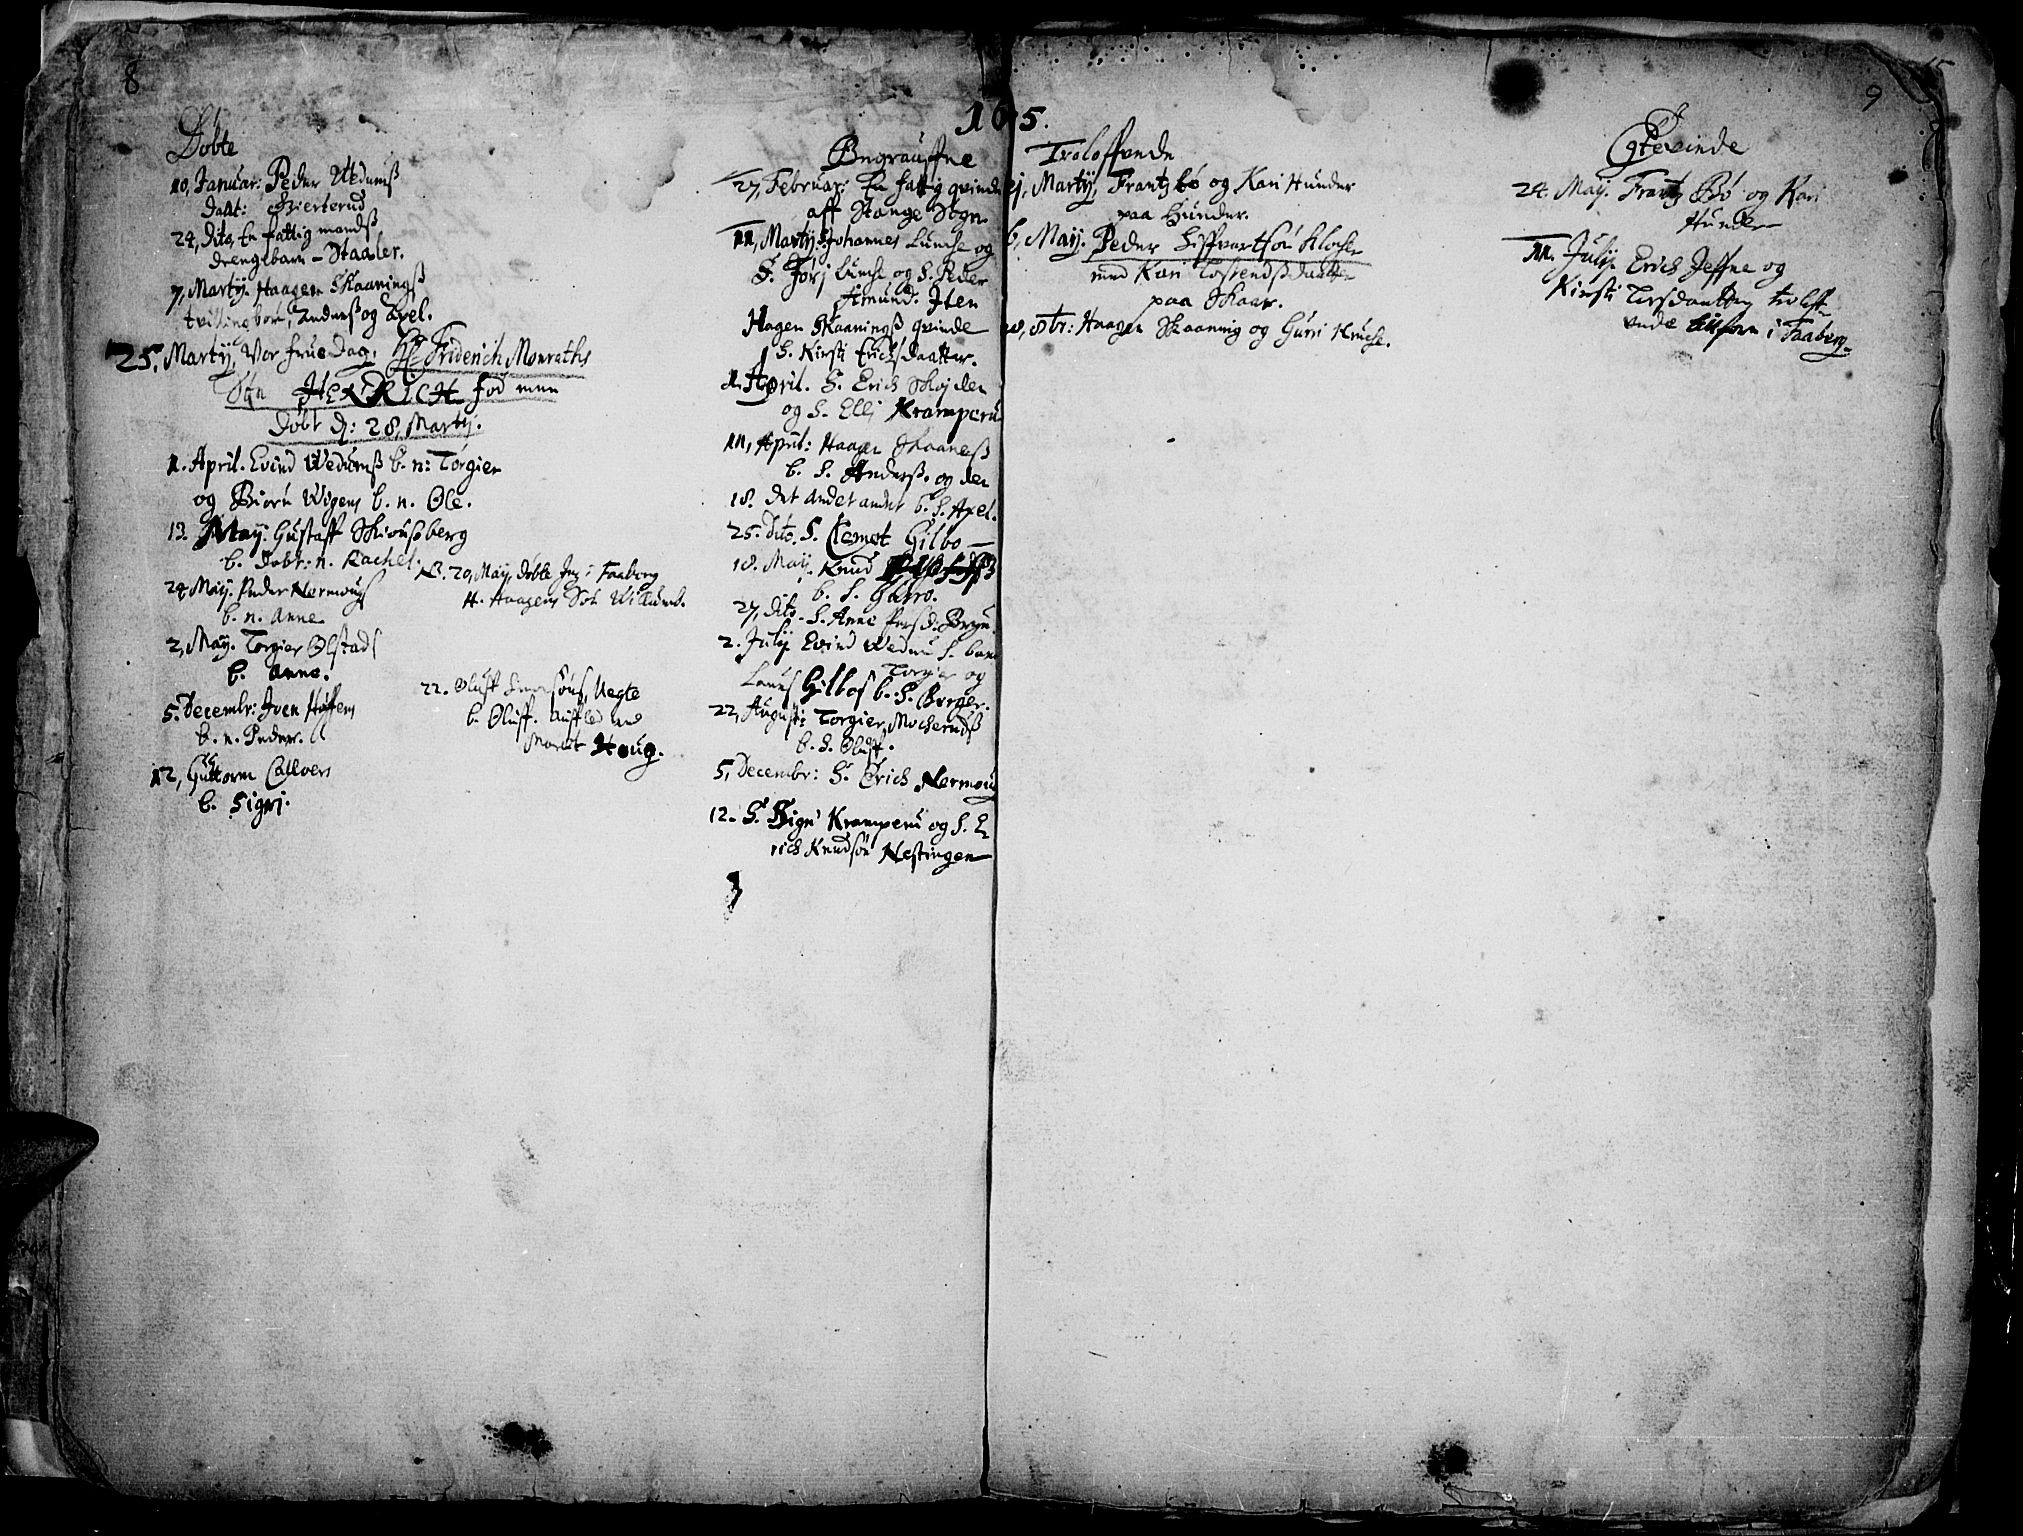 SAH, Øyer prestekontor, Ministerialbok nr. 1, 1671-1727, s. 8-9